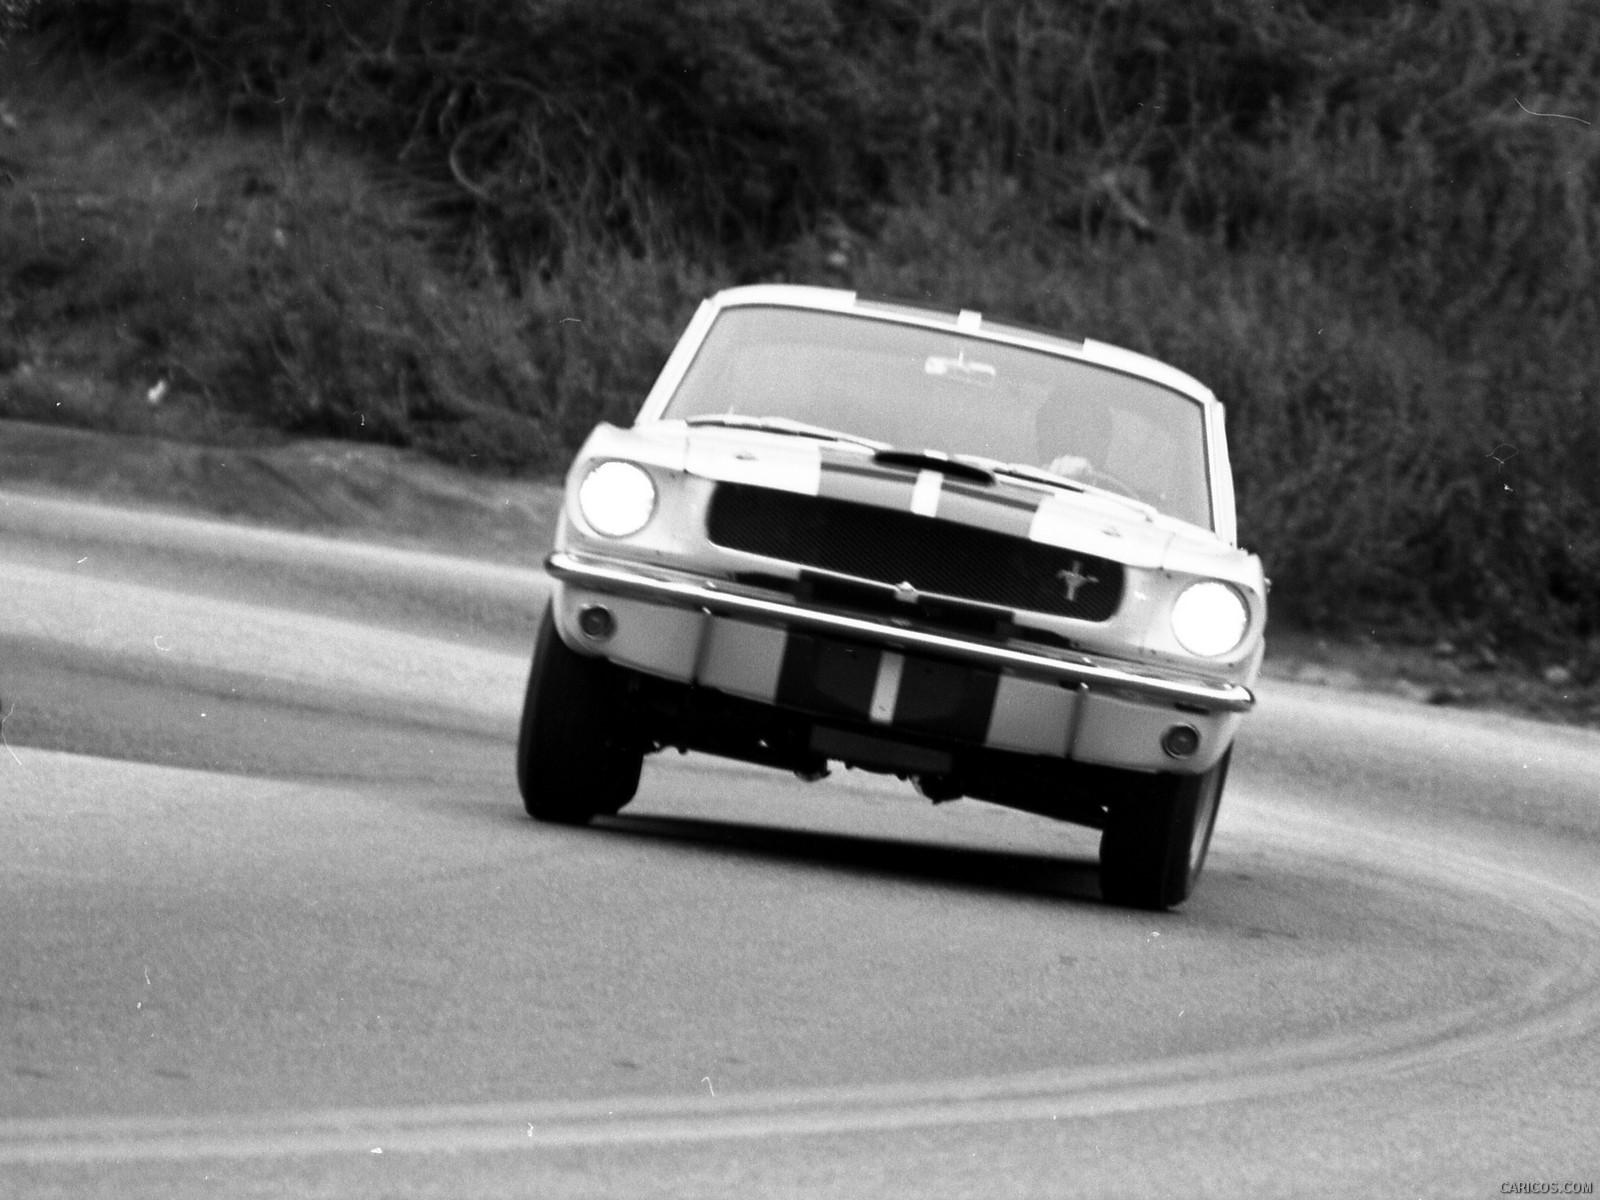 Ford Mustang Shelby GT350 duvarkağıdı